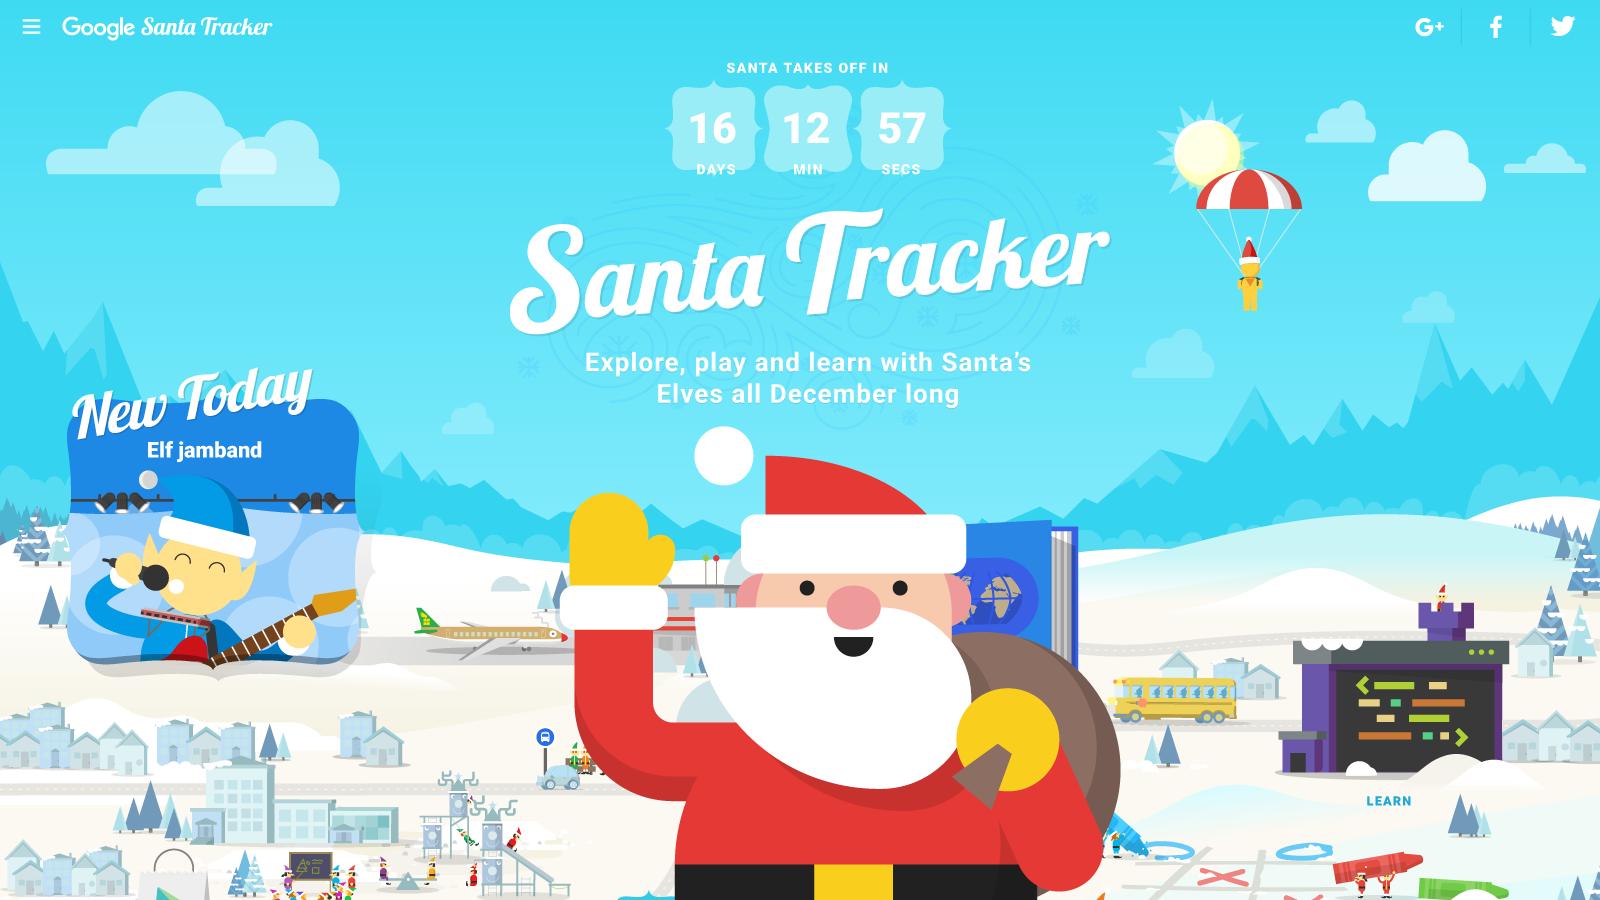 santa-tracker-village-with-santa